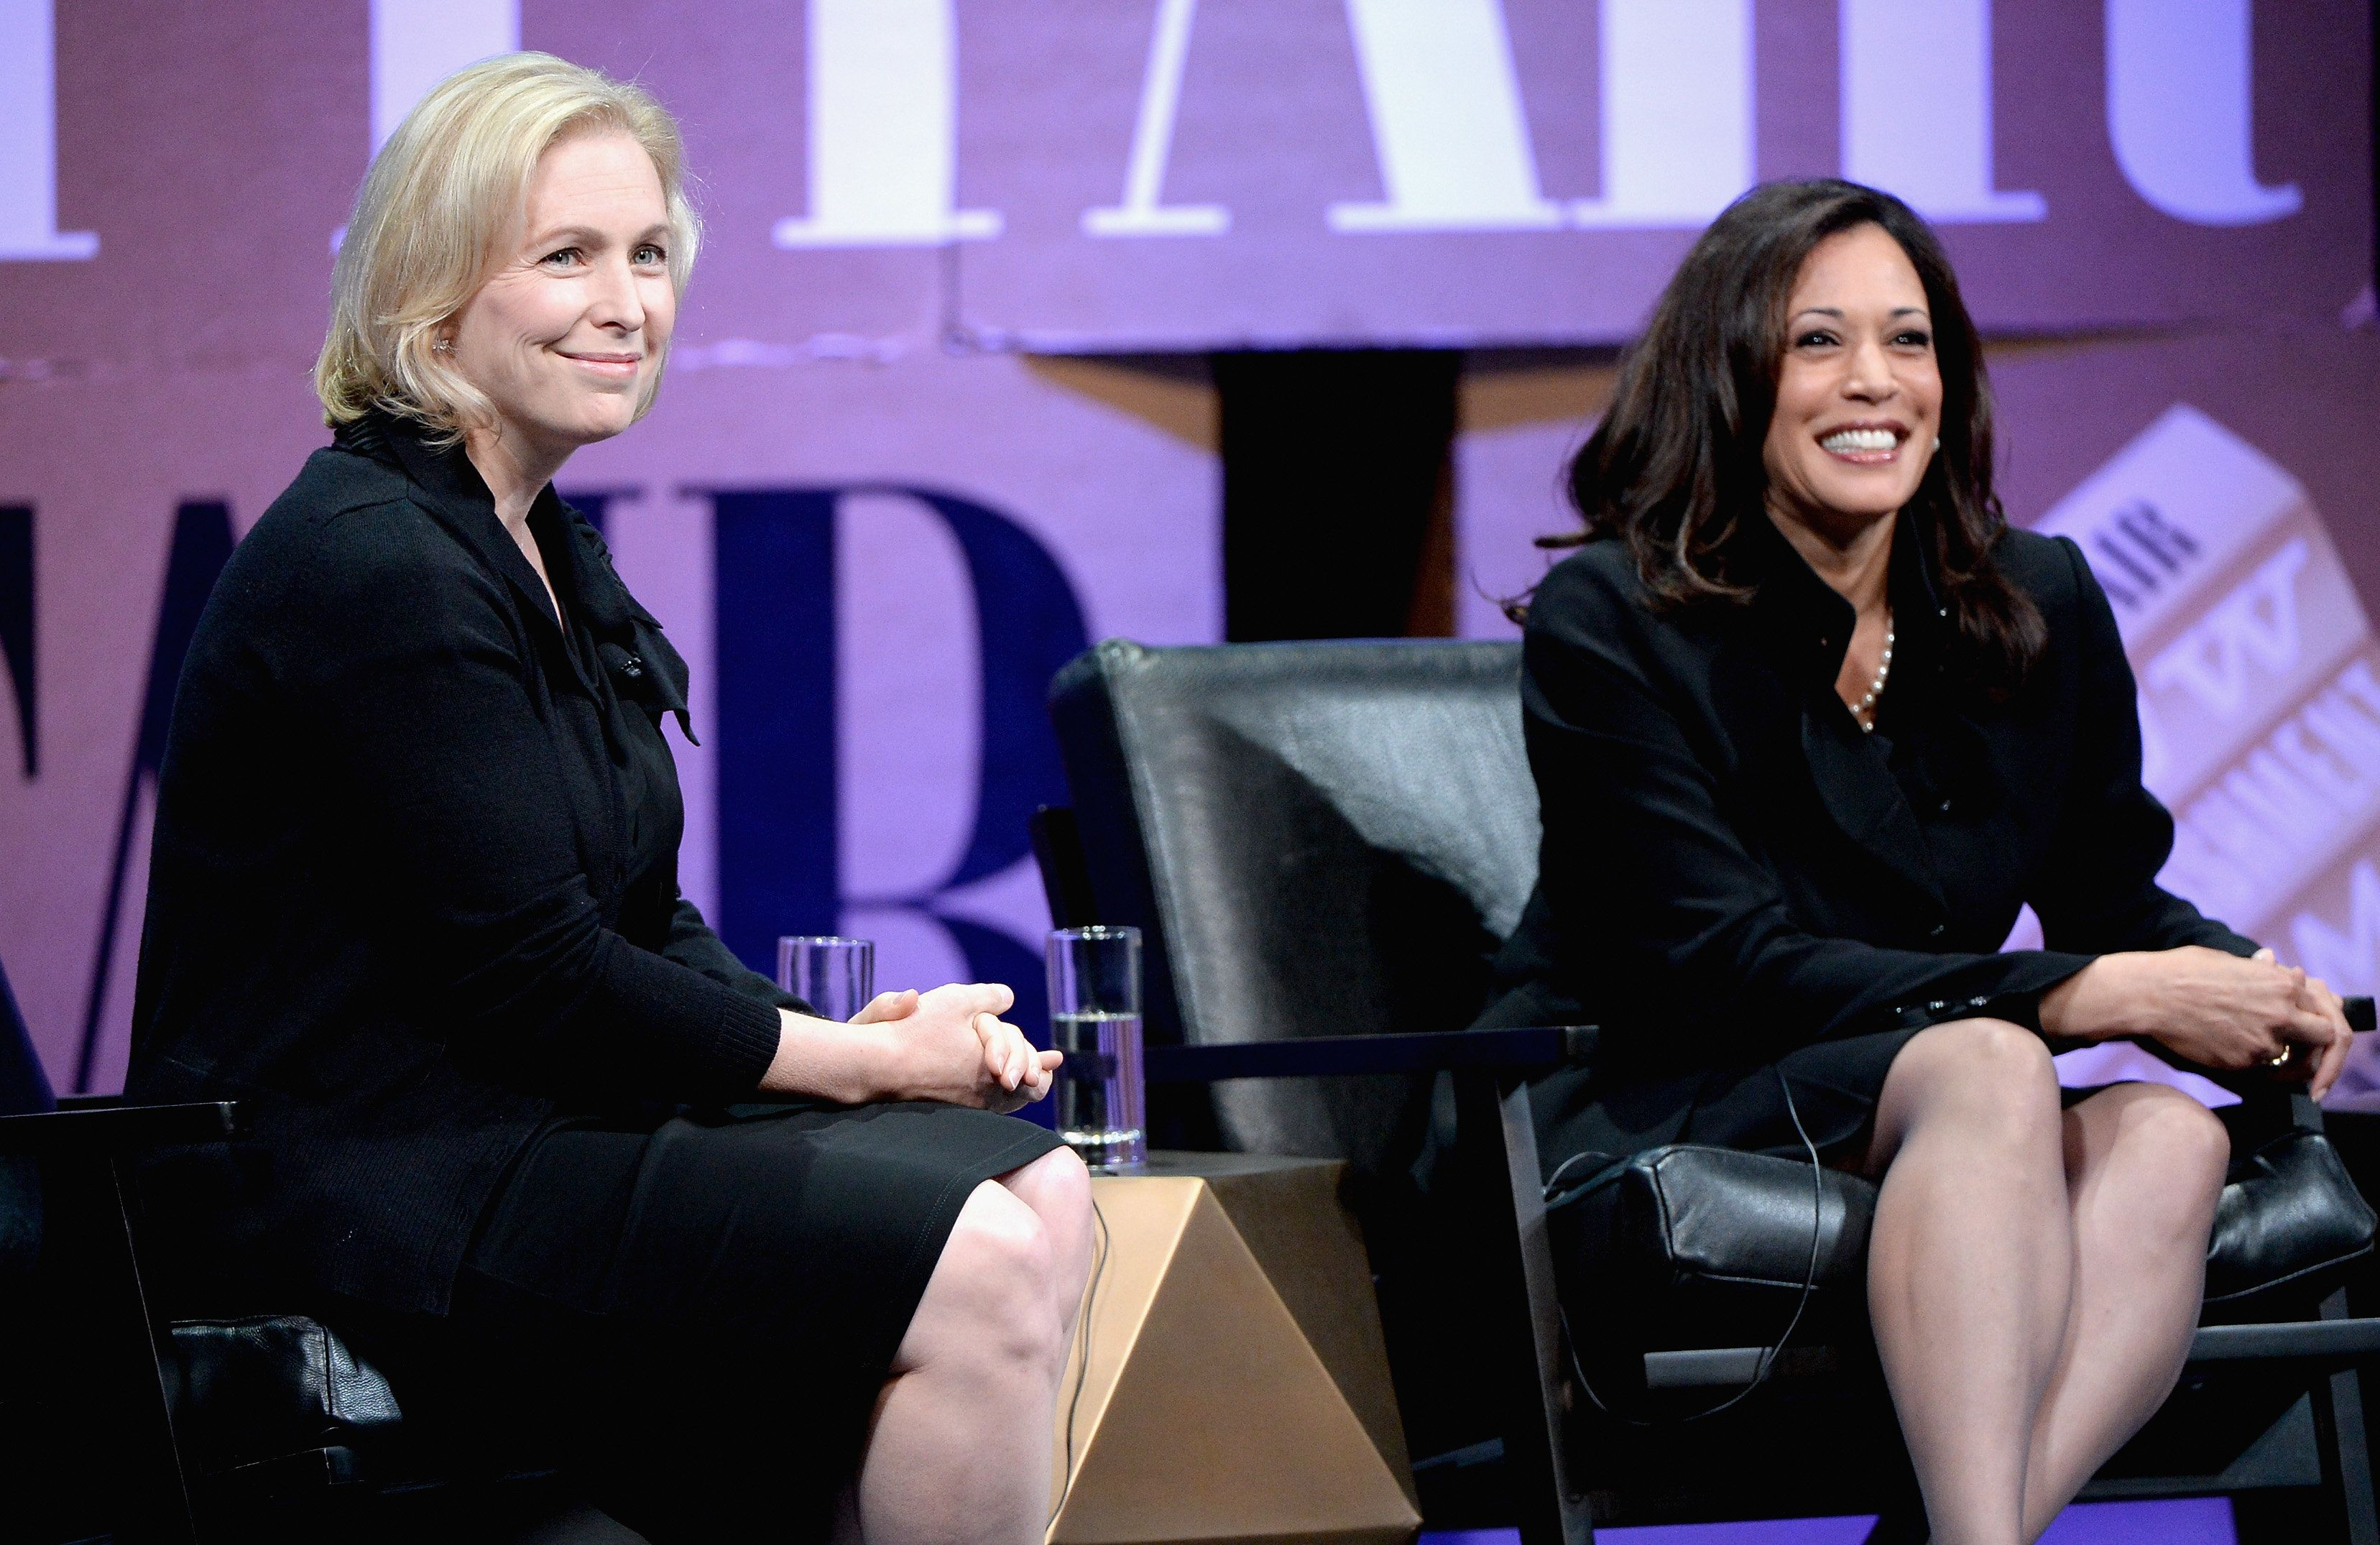 Sens. Kirsten Gillibrand (D-N.Y.) and Kamala Harris (D-Calif.) co-sponsored theStop Enabling Sex Trafficking Act (SESTA